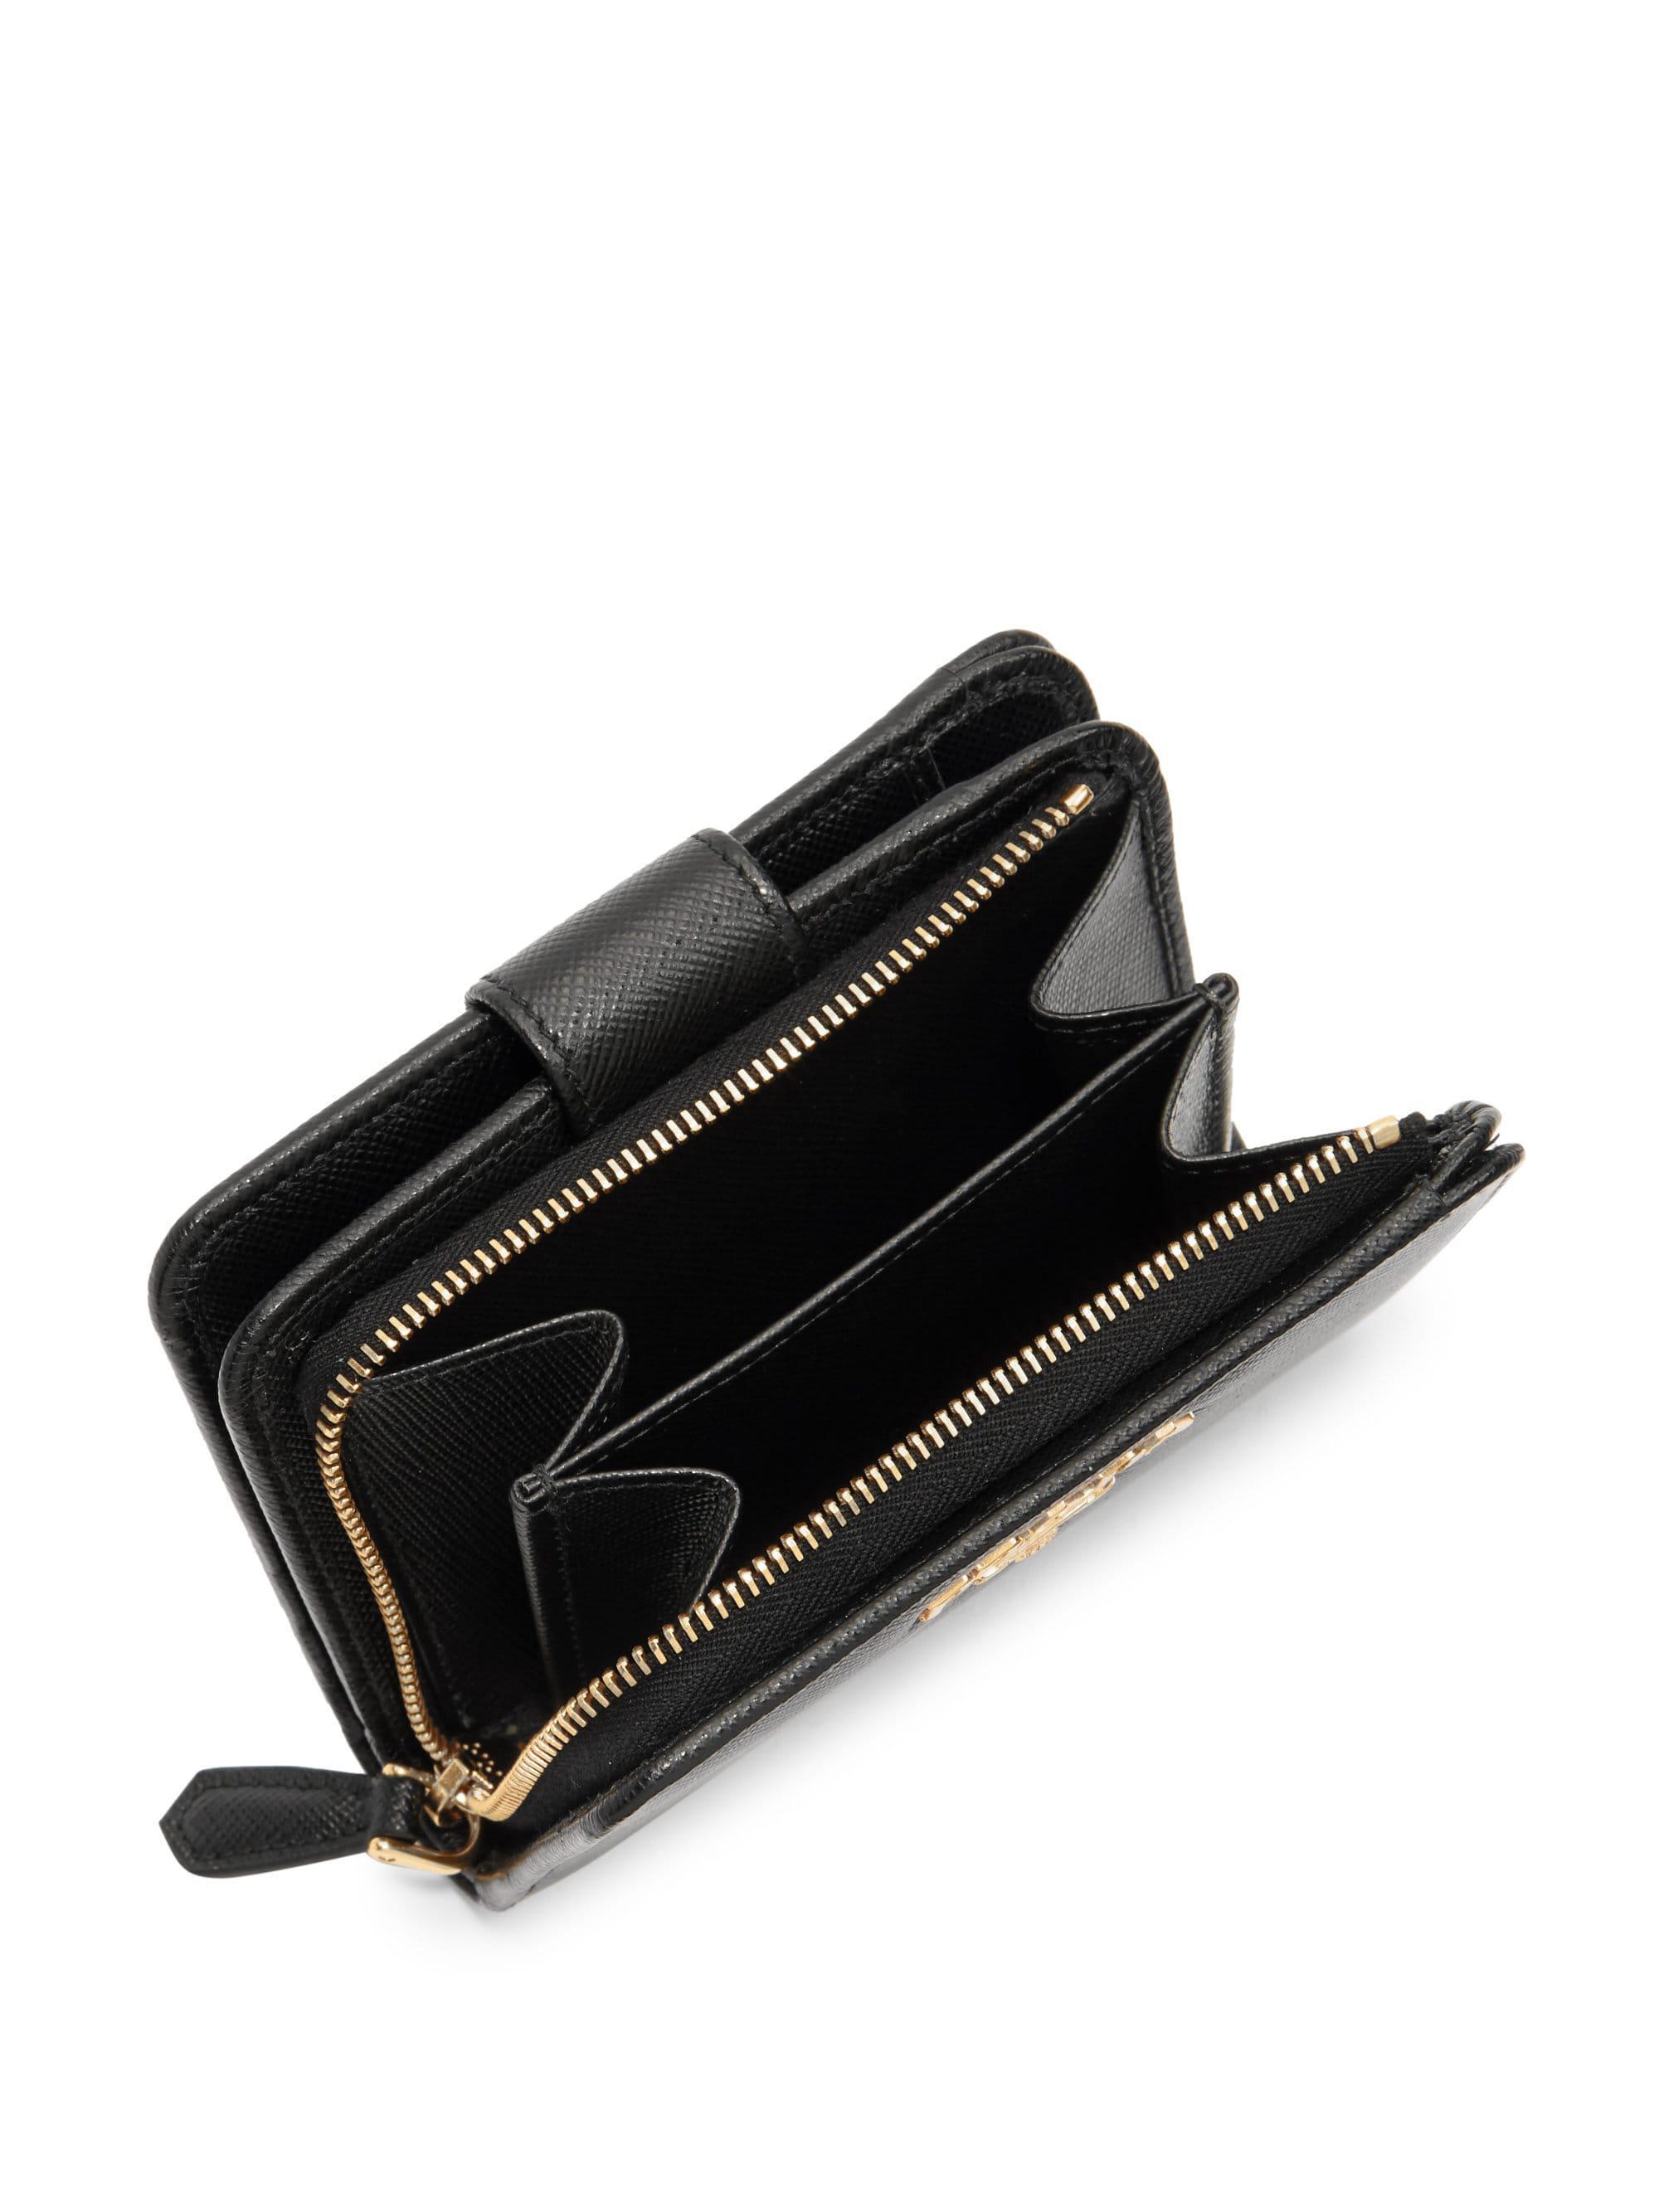 83c795417123 ... greece prada small saffiano leather tab wallet in black lyst 0a9fd c4bee